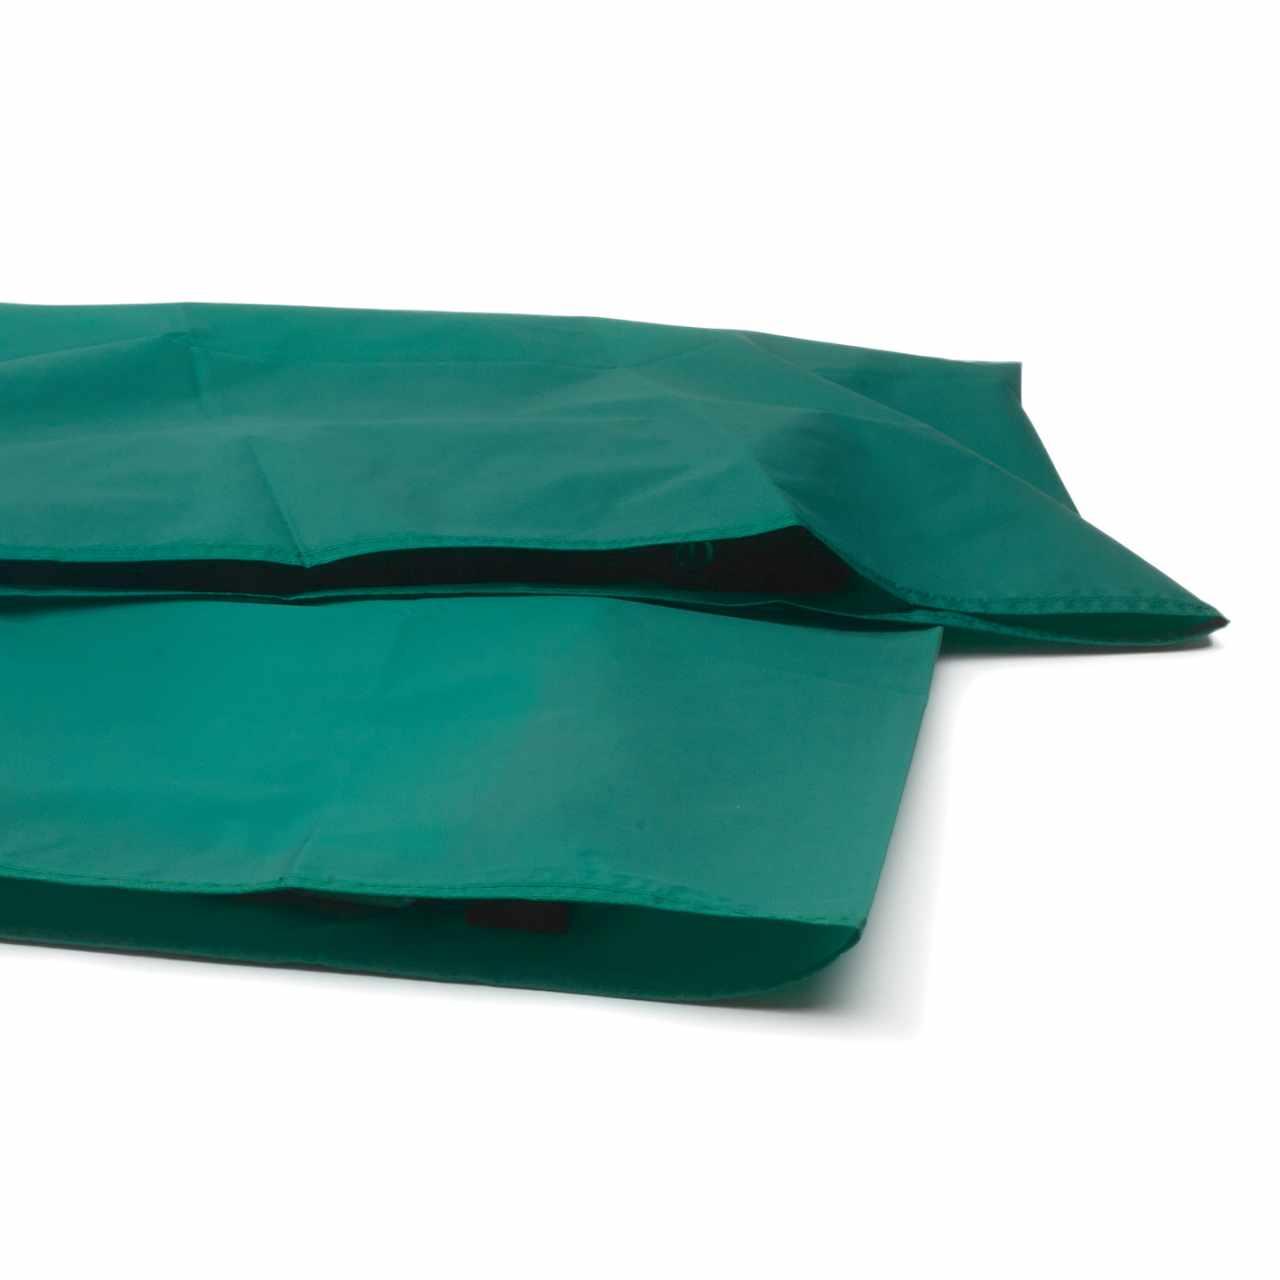 Immedia nylon cover for narrow transfermattress